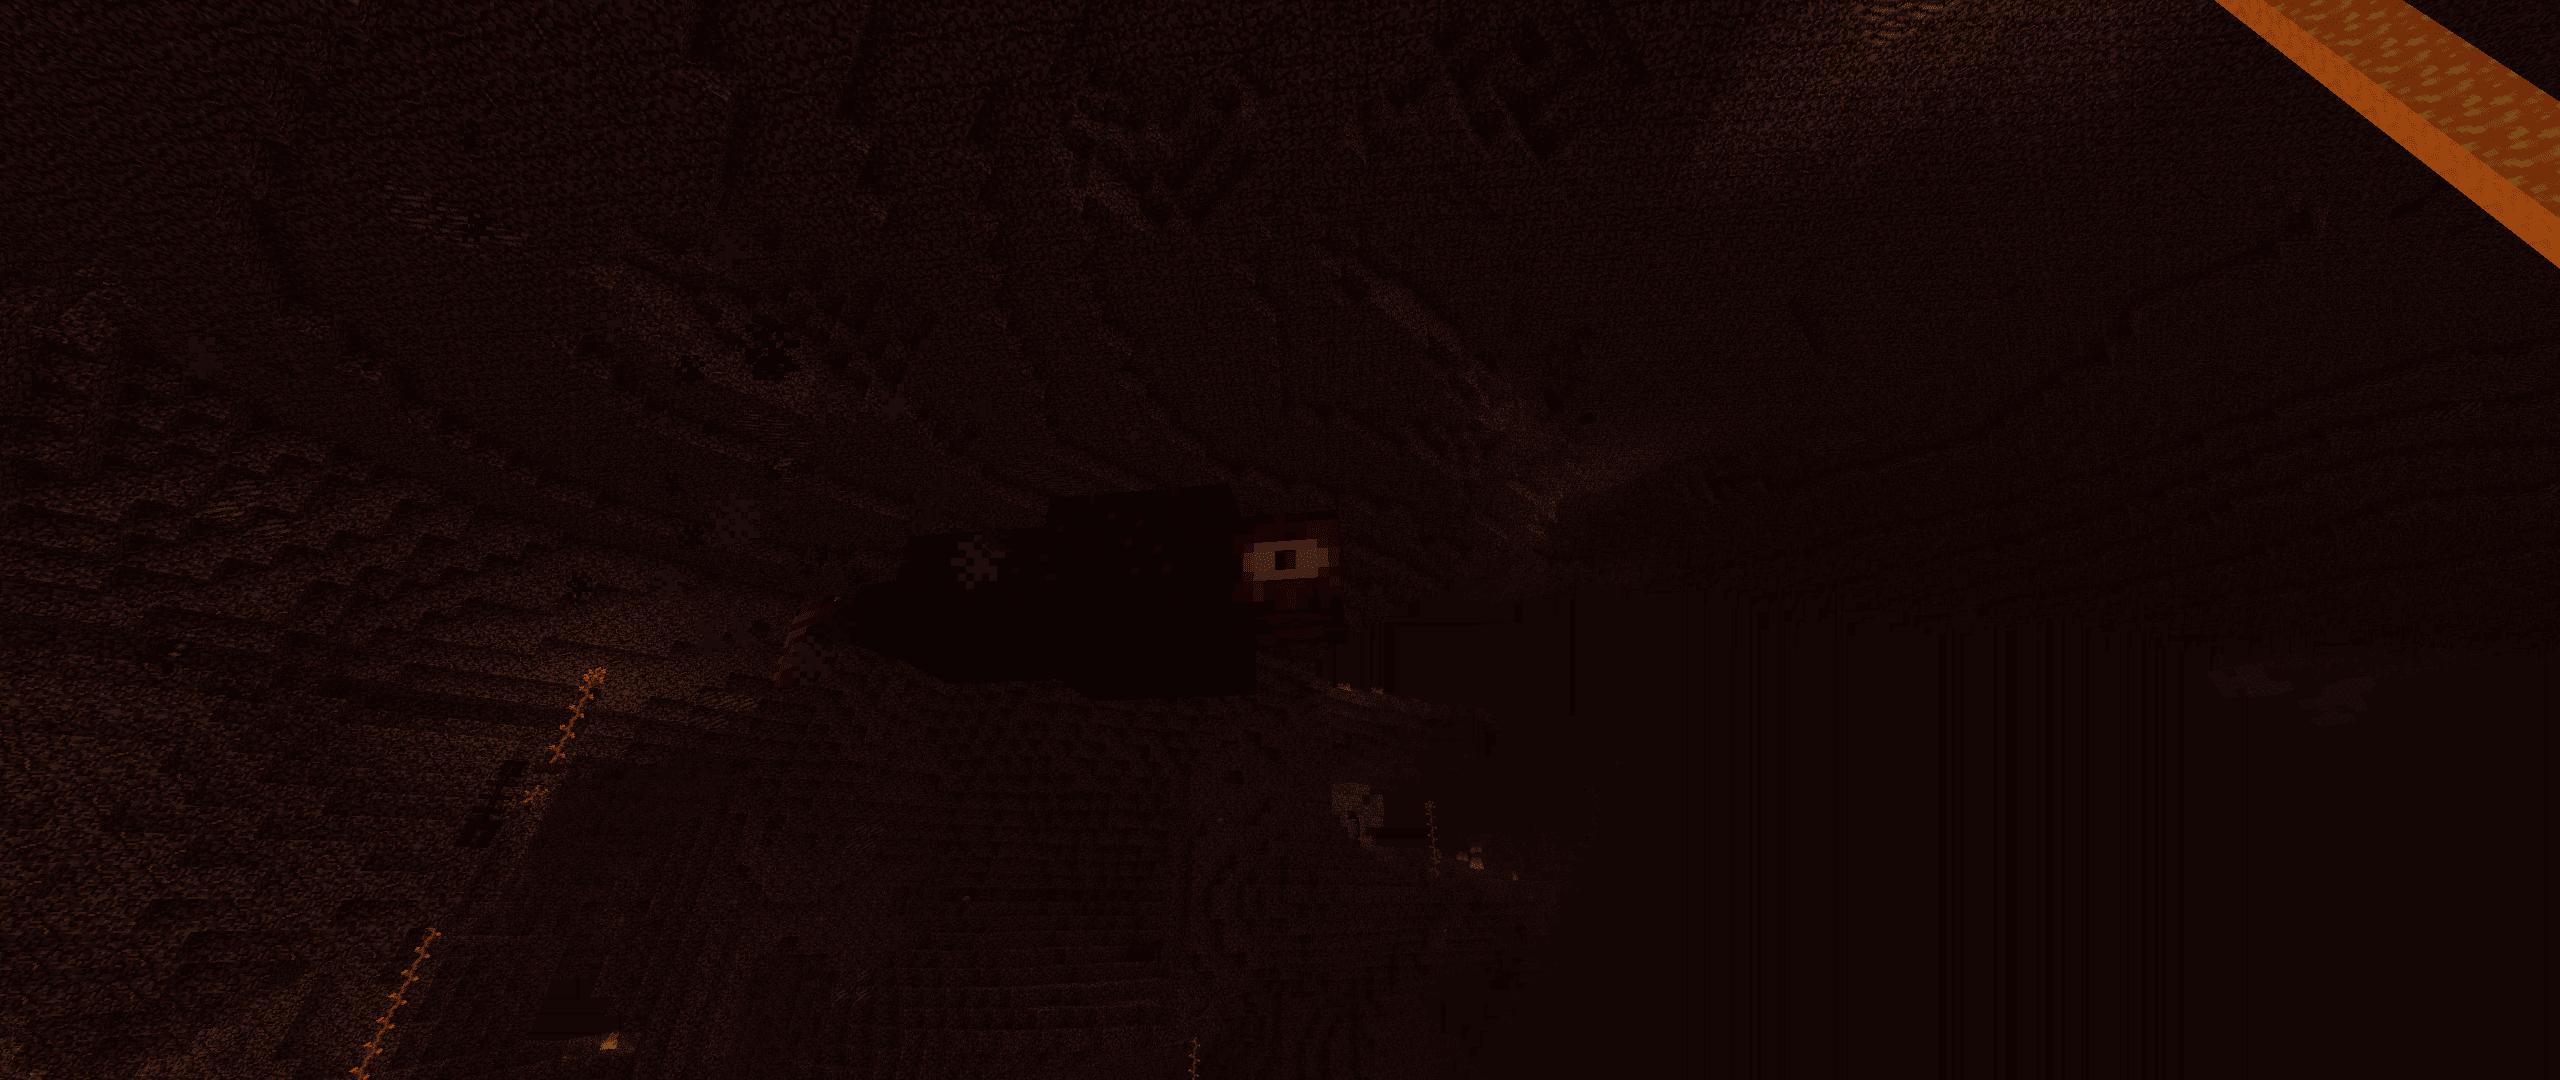 [Mod][1.8.9] Journey into the light - новый DivineRPG!